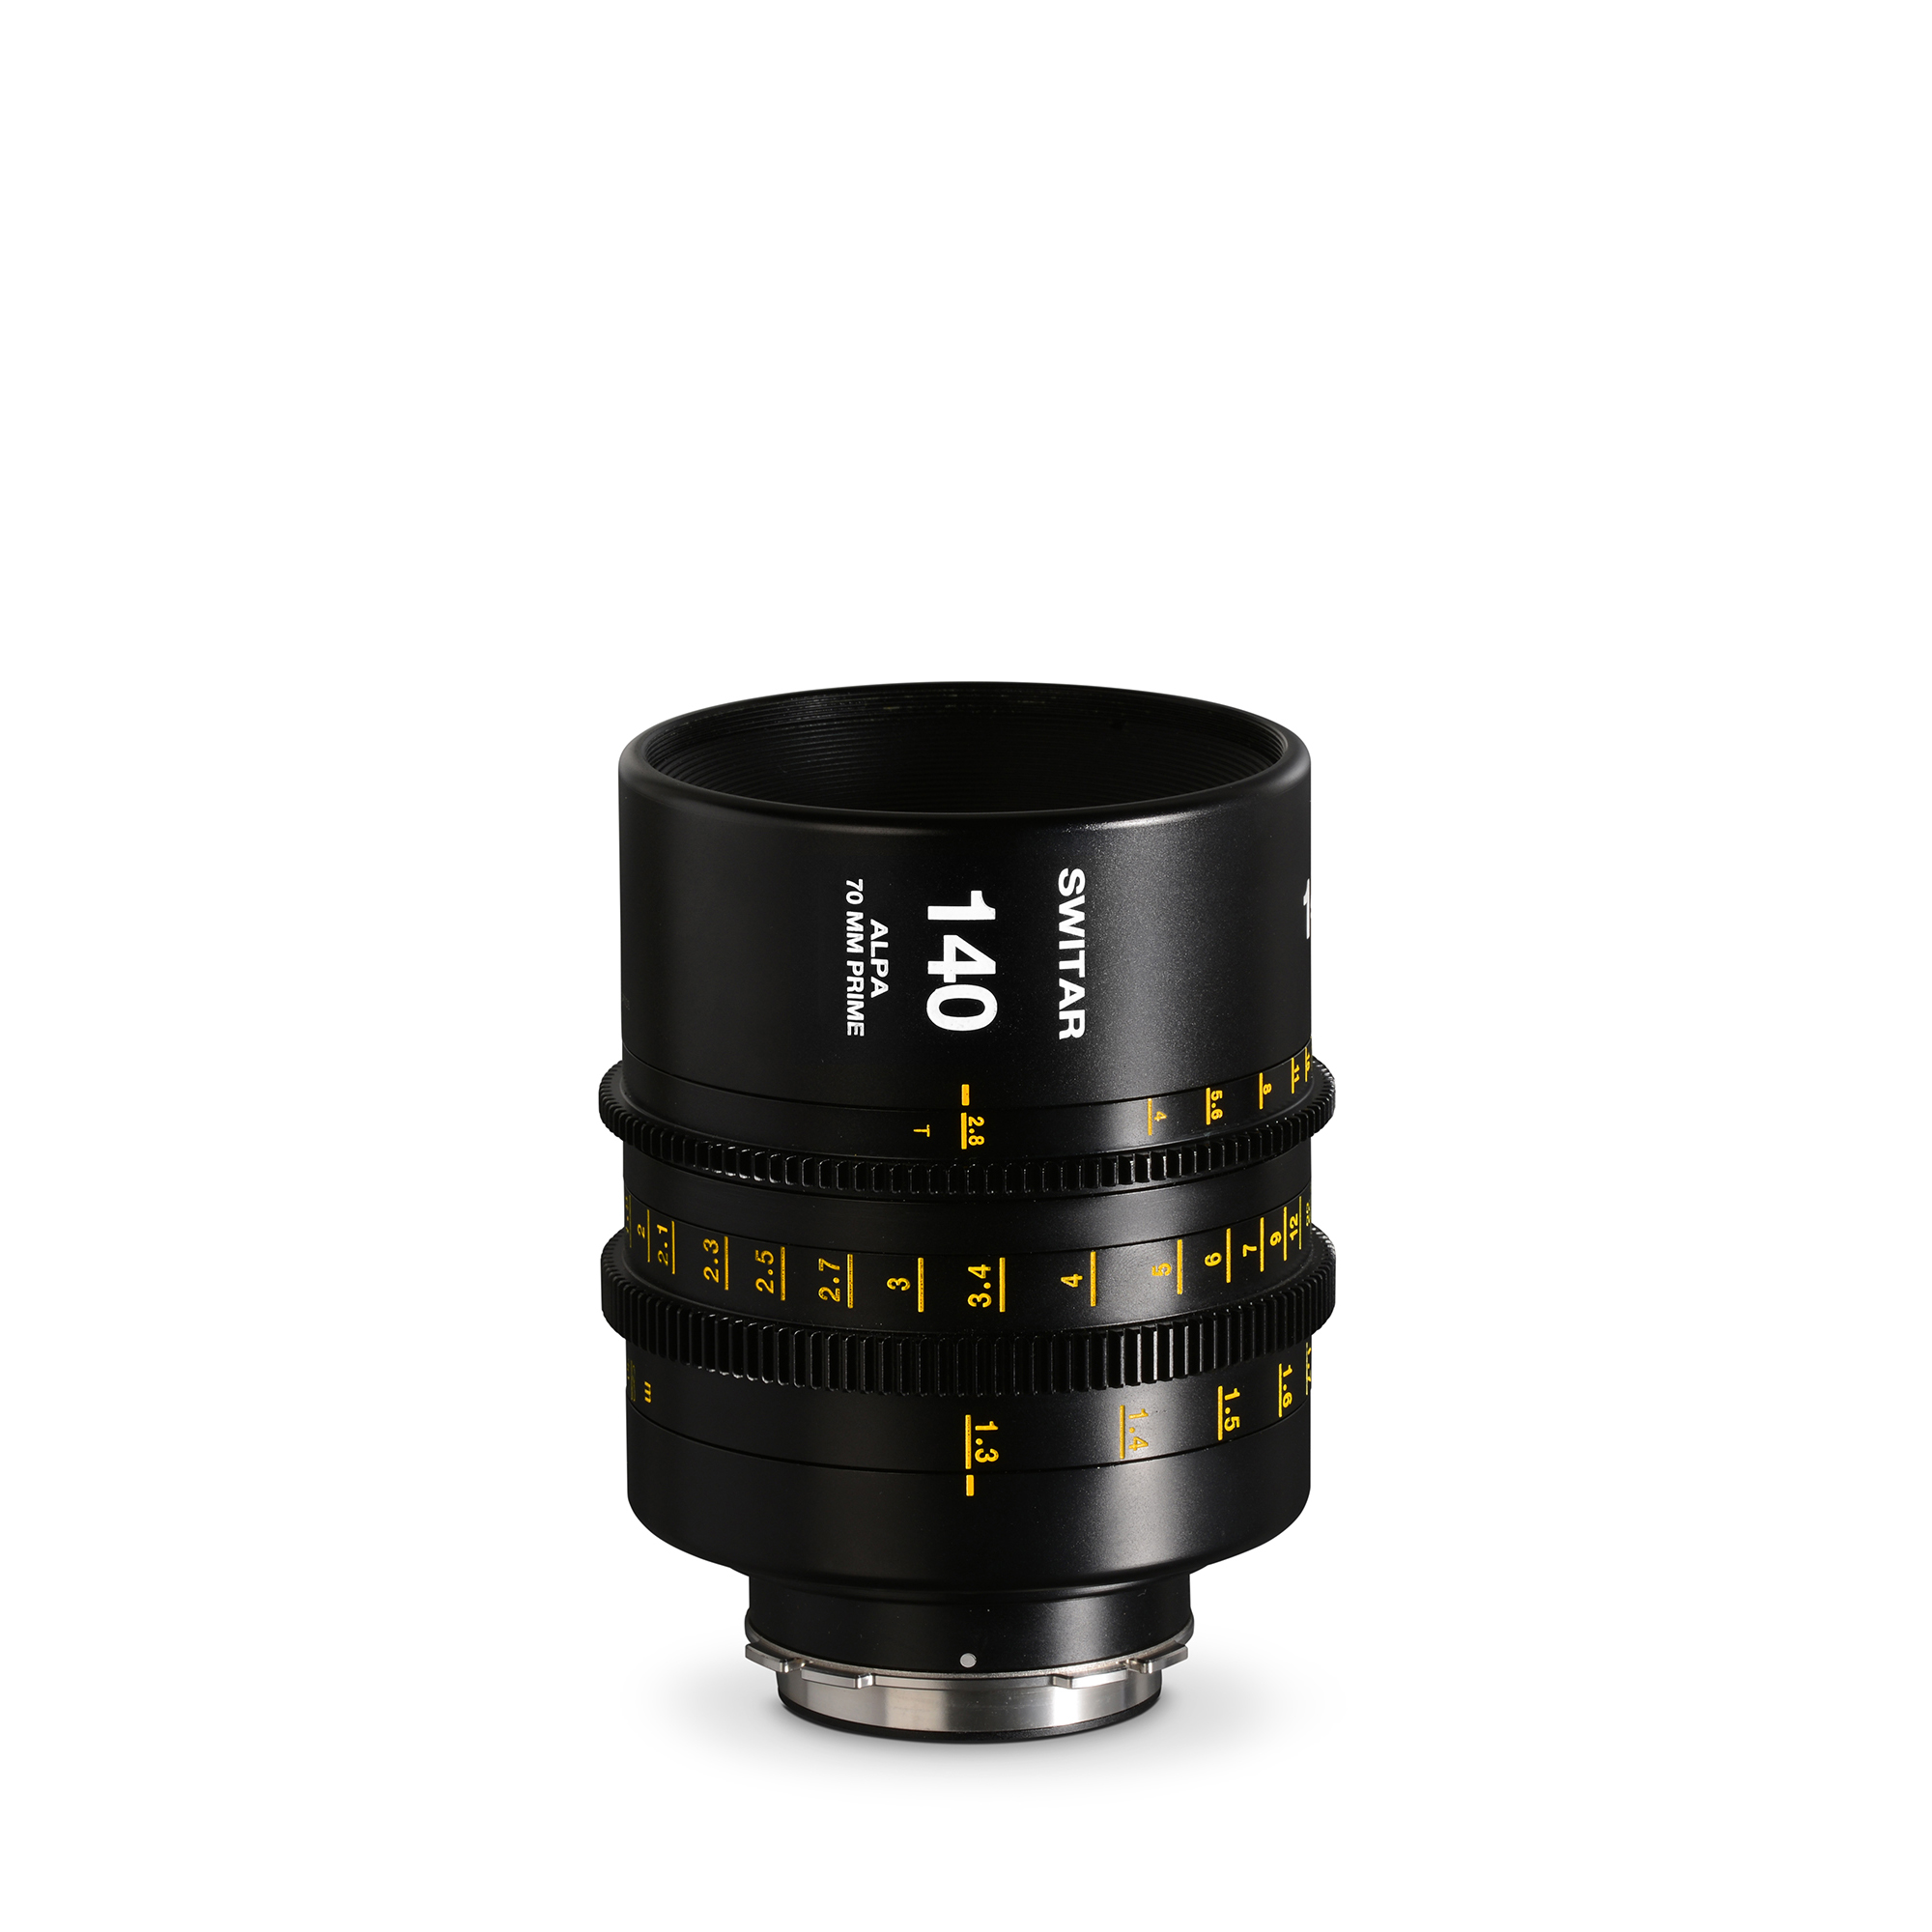 ALPA Коммутатор 2,8/140 мм Cine Prime IC 70 мм - метры